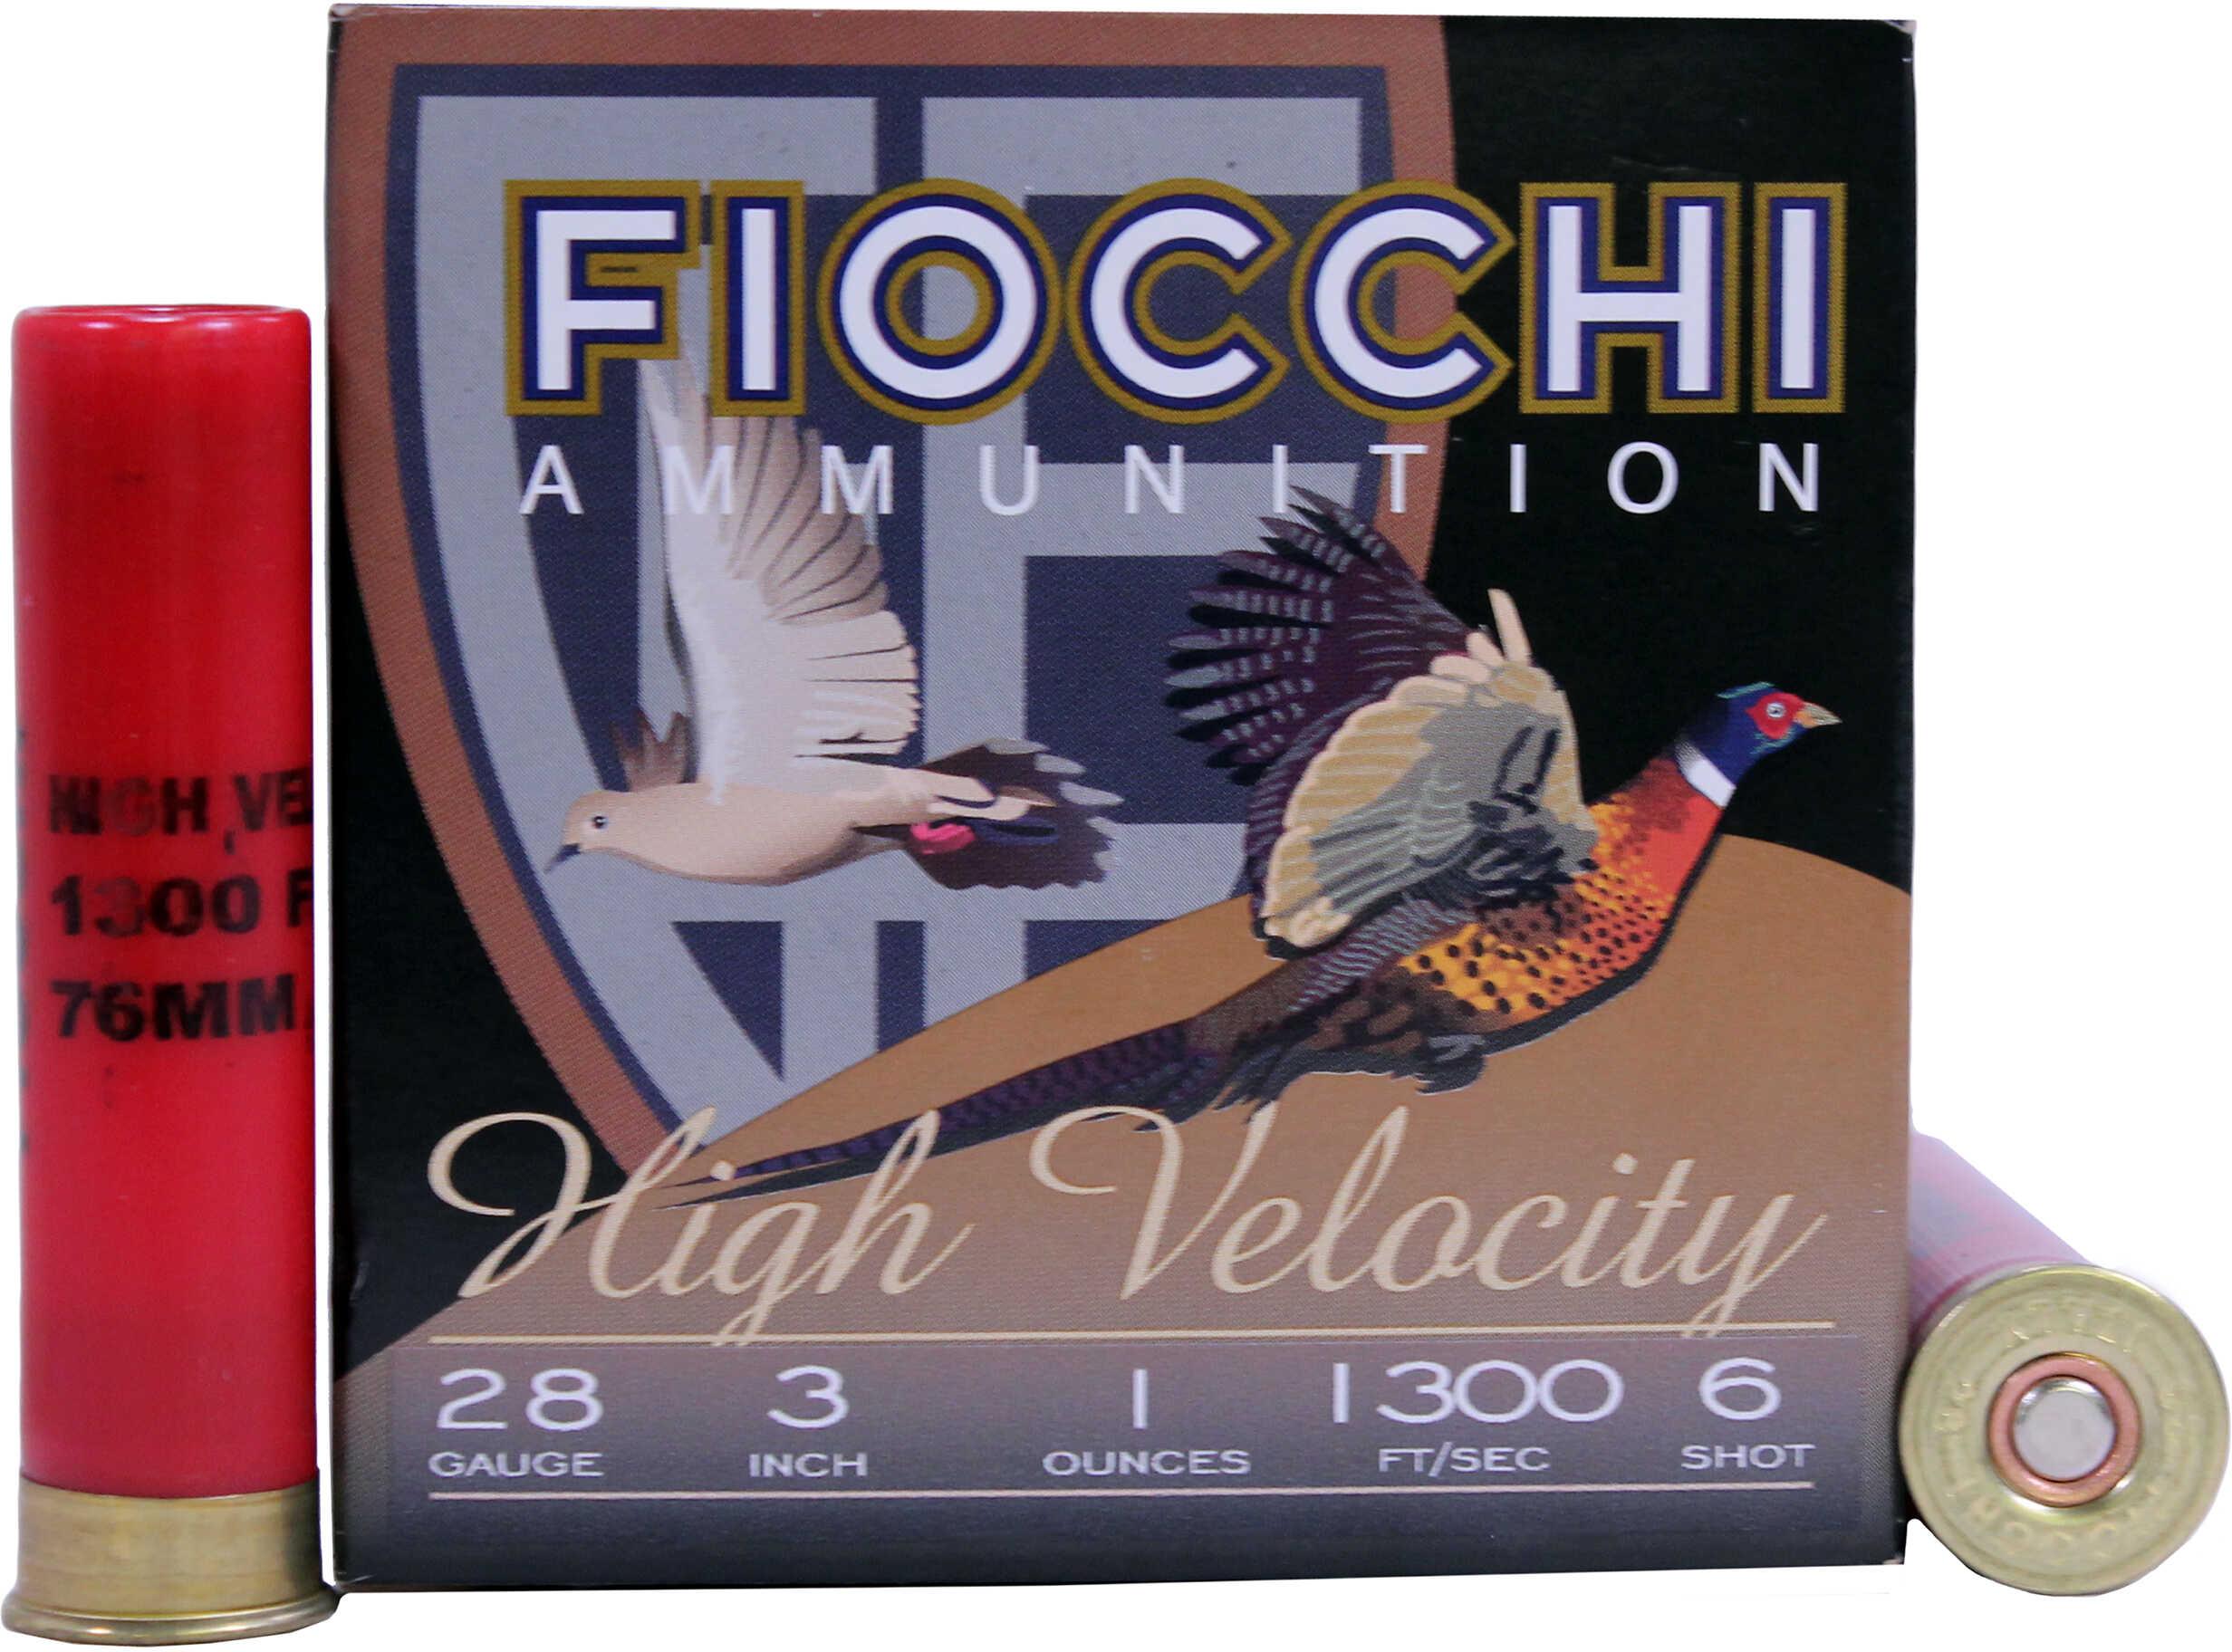 "Fiocchi Ammunition 28 Gauge High Velocity, 3"" Chamber, 6 Shot, 1 oz Md: 283HV6"